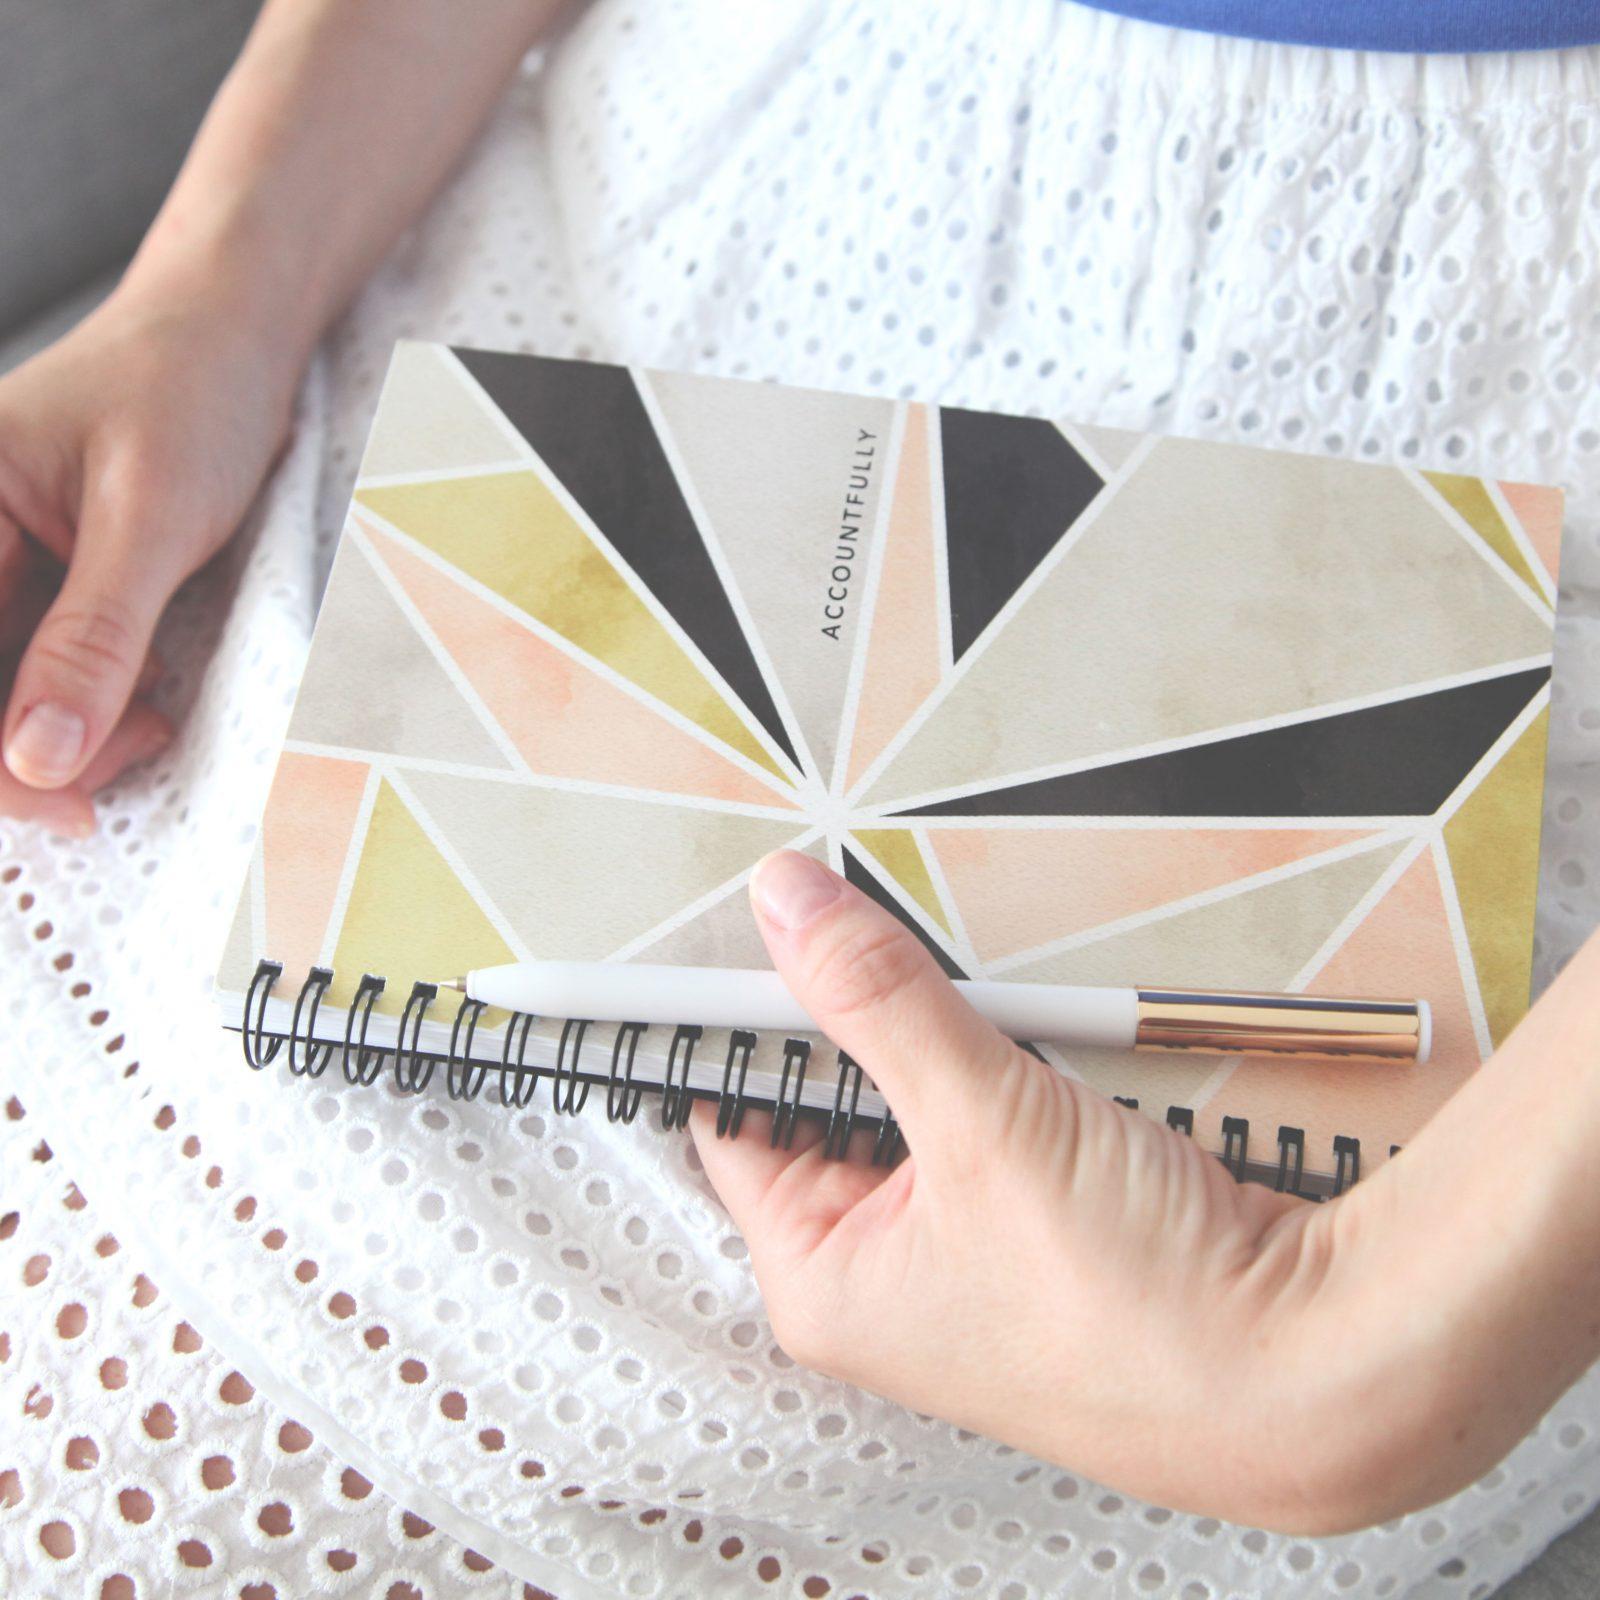 Accountfully notebook